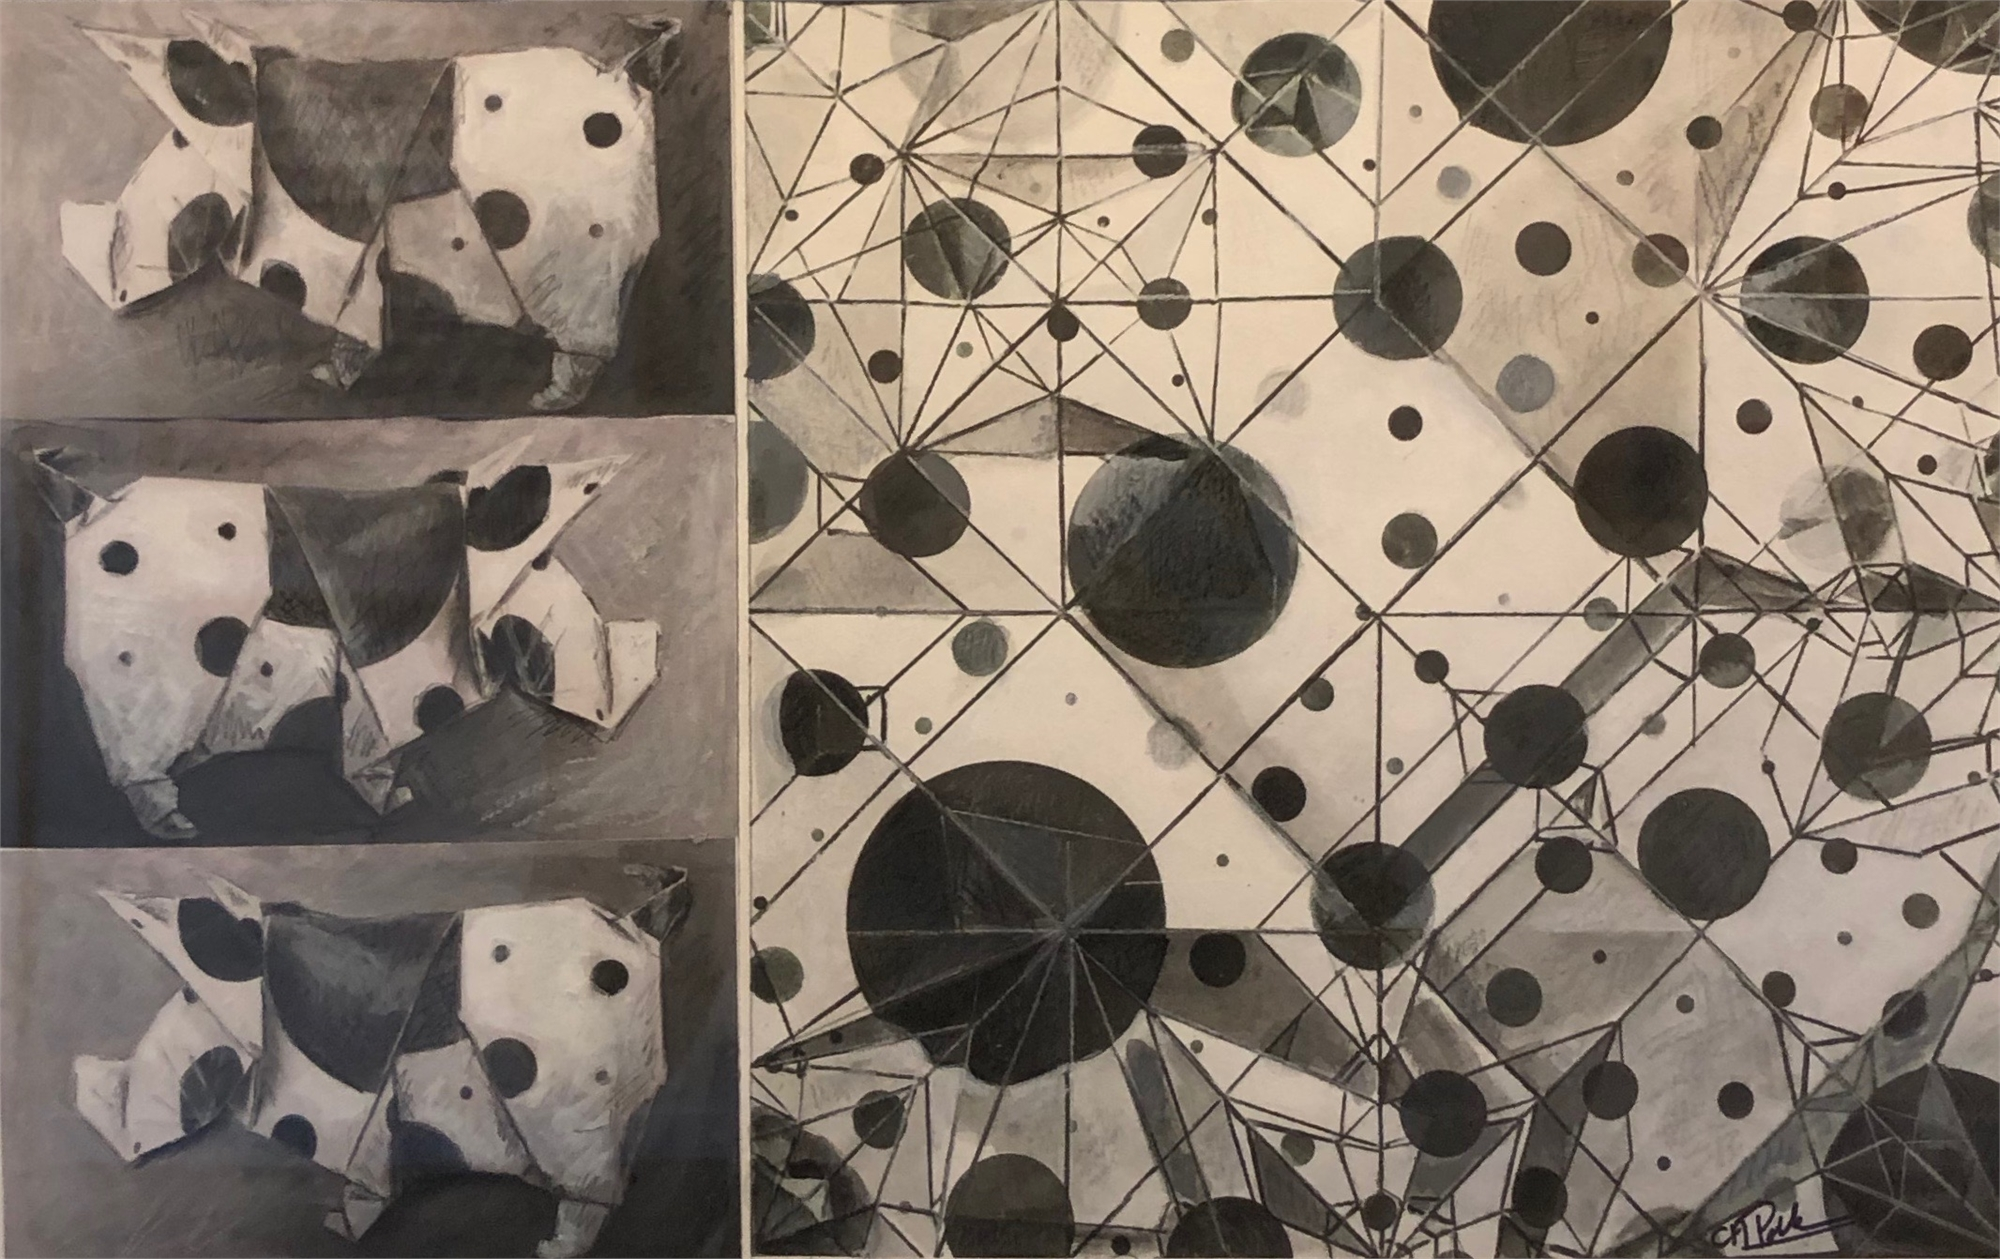 Year of the Pig III by Chun Hui Pak